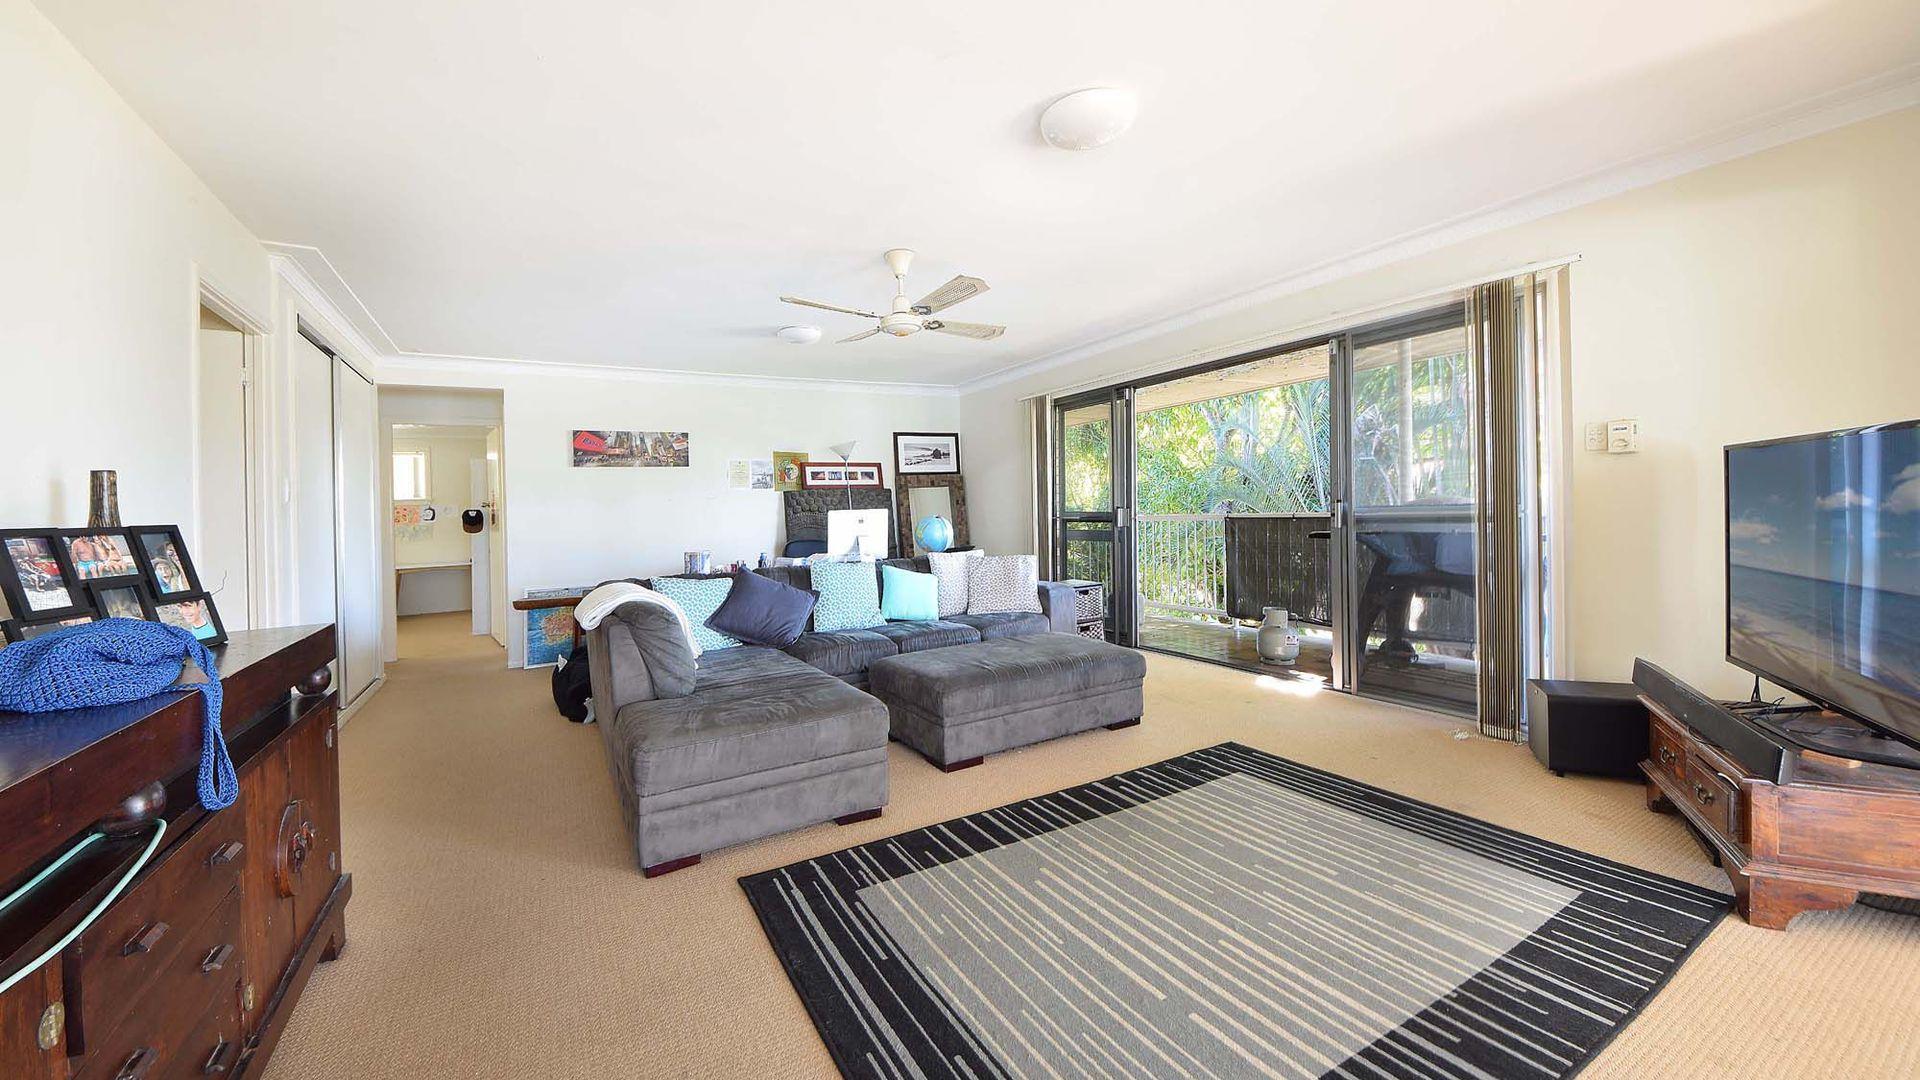 1/11 Awoonga Avenue, Burleigh Heads QLD 4220, Image 2